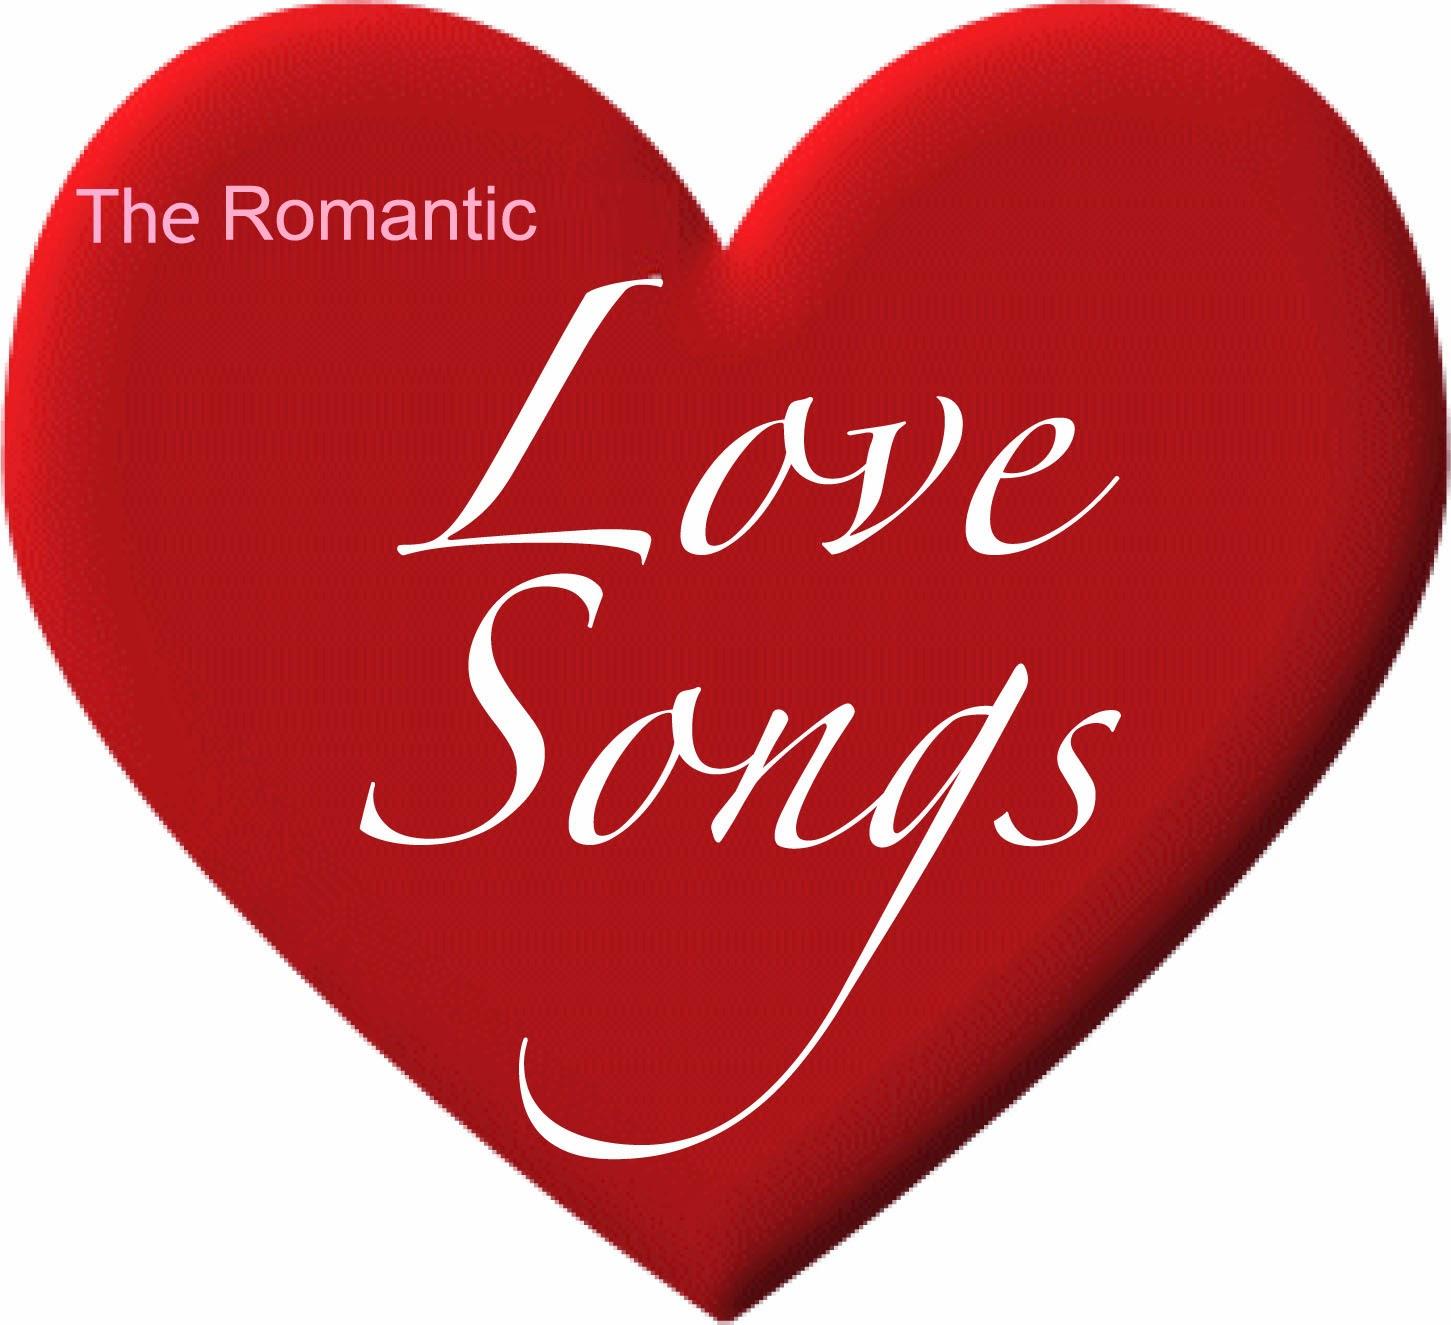 Music N Songs 2014 Latest Top New Romantic Love Songs 2014 List